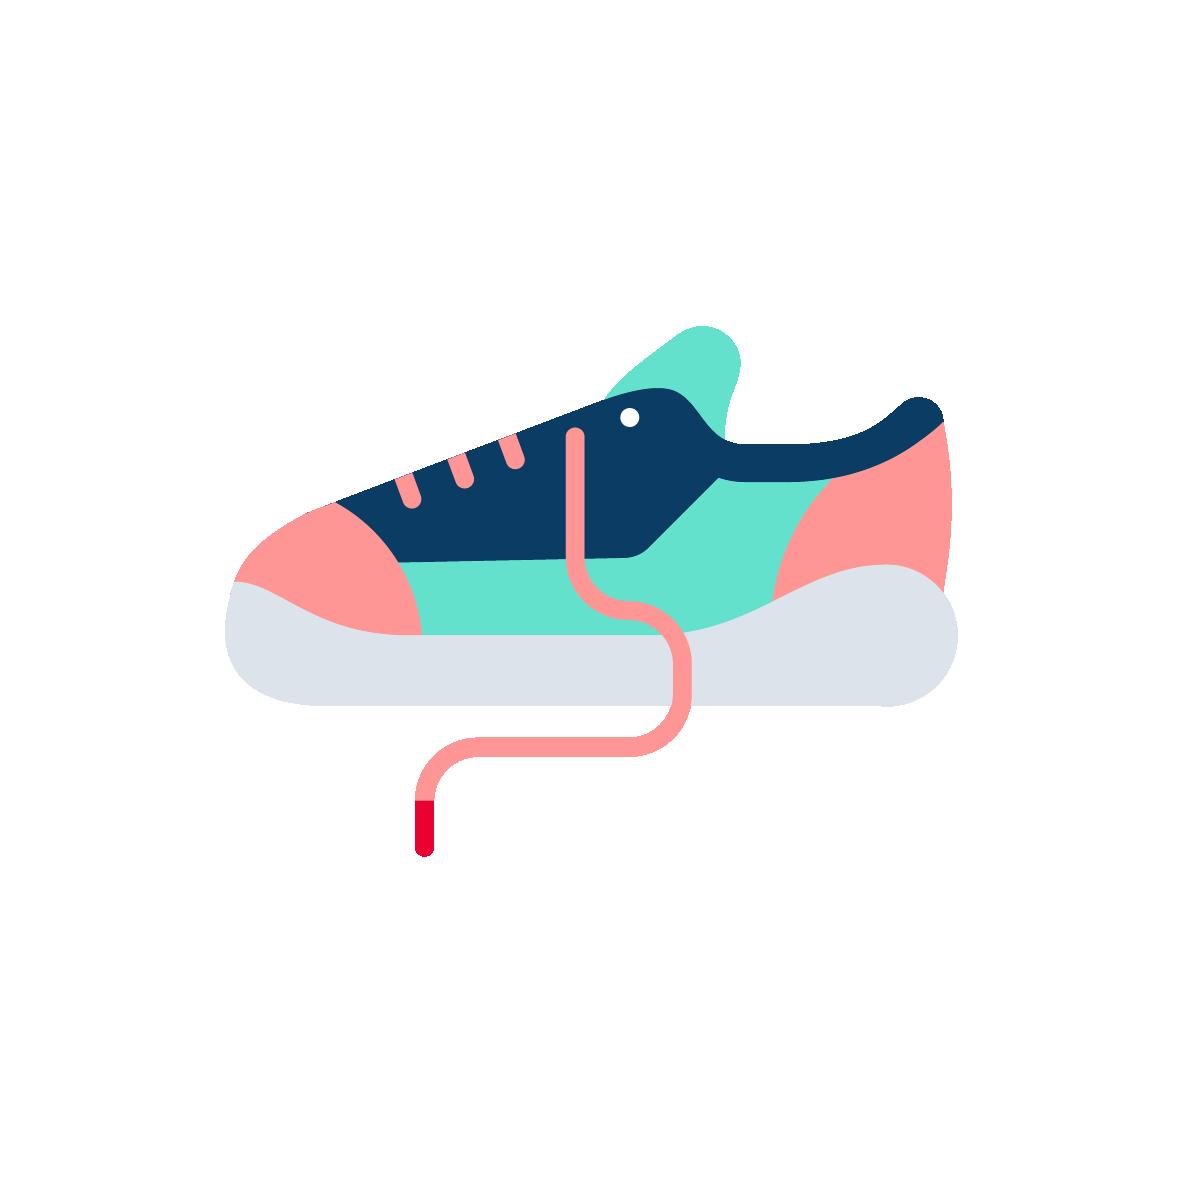 Trainers pictogram